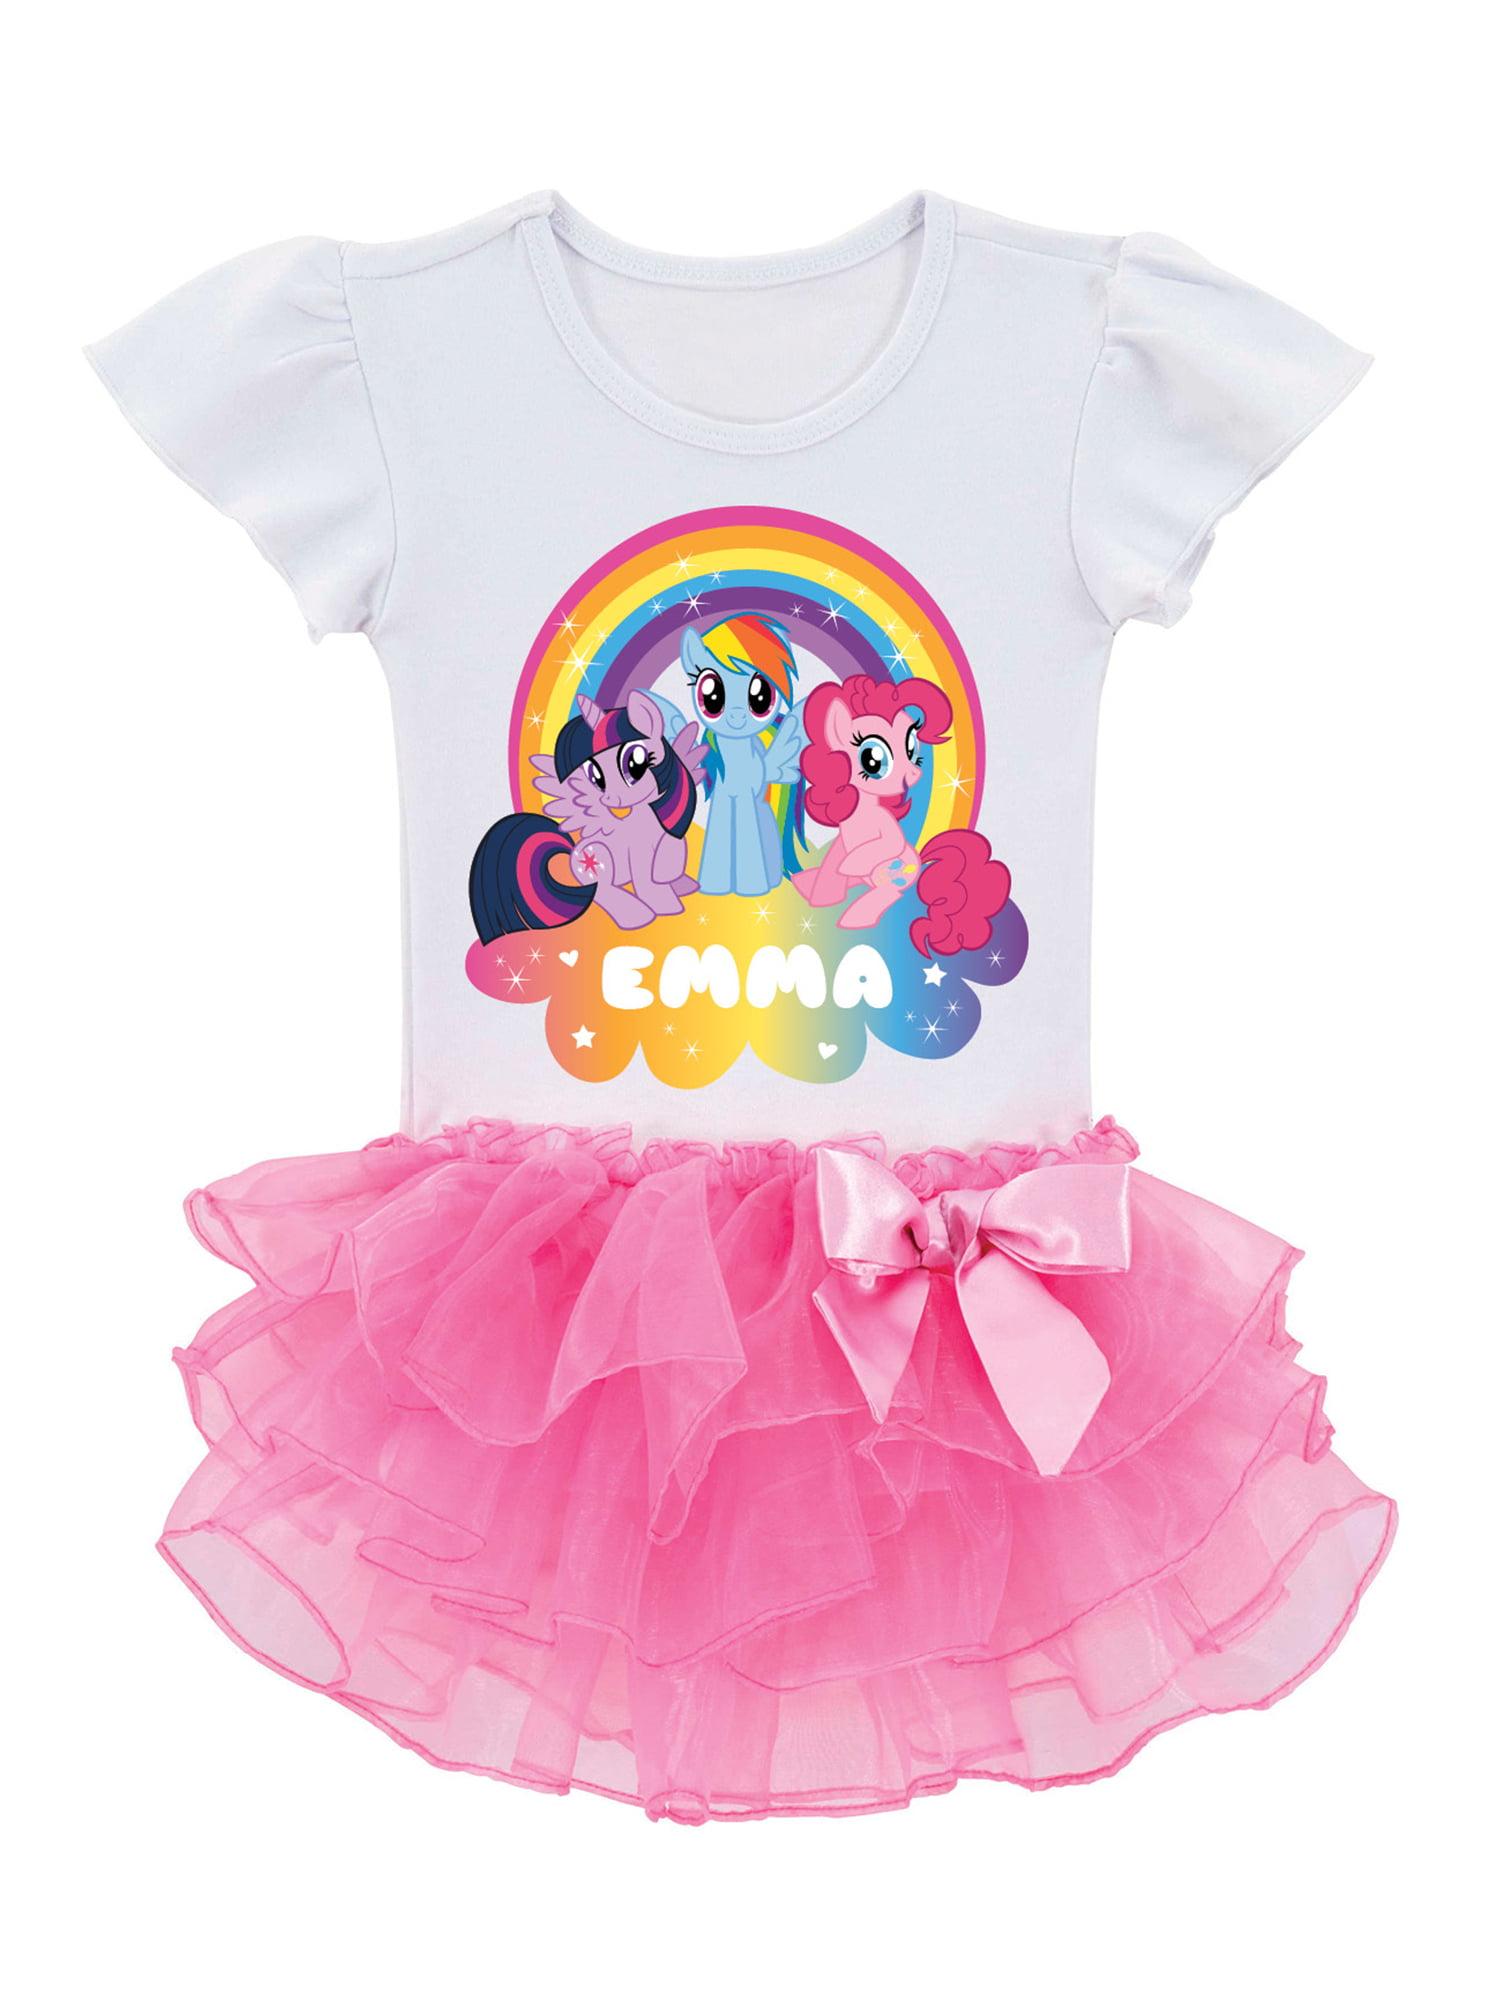 Personalized My Little Pony Rainbow Magic Toddler Girls' Tutu T-Shirt